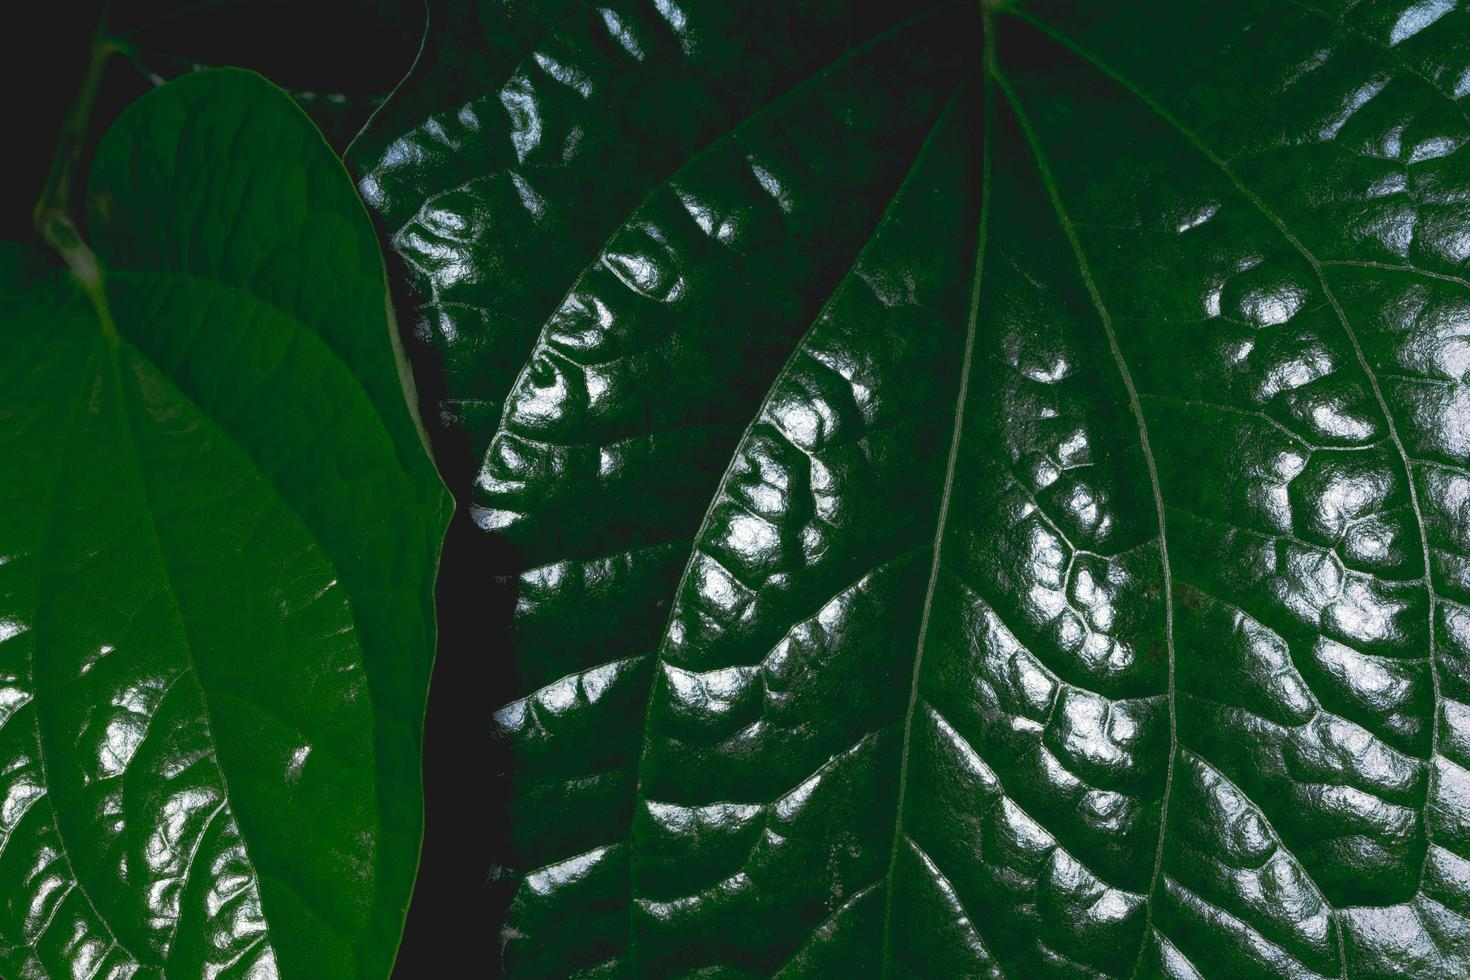 groene bladeren met donkere toon achtergrond foto